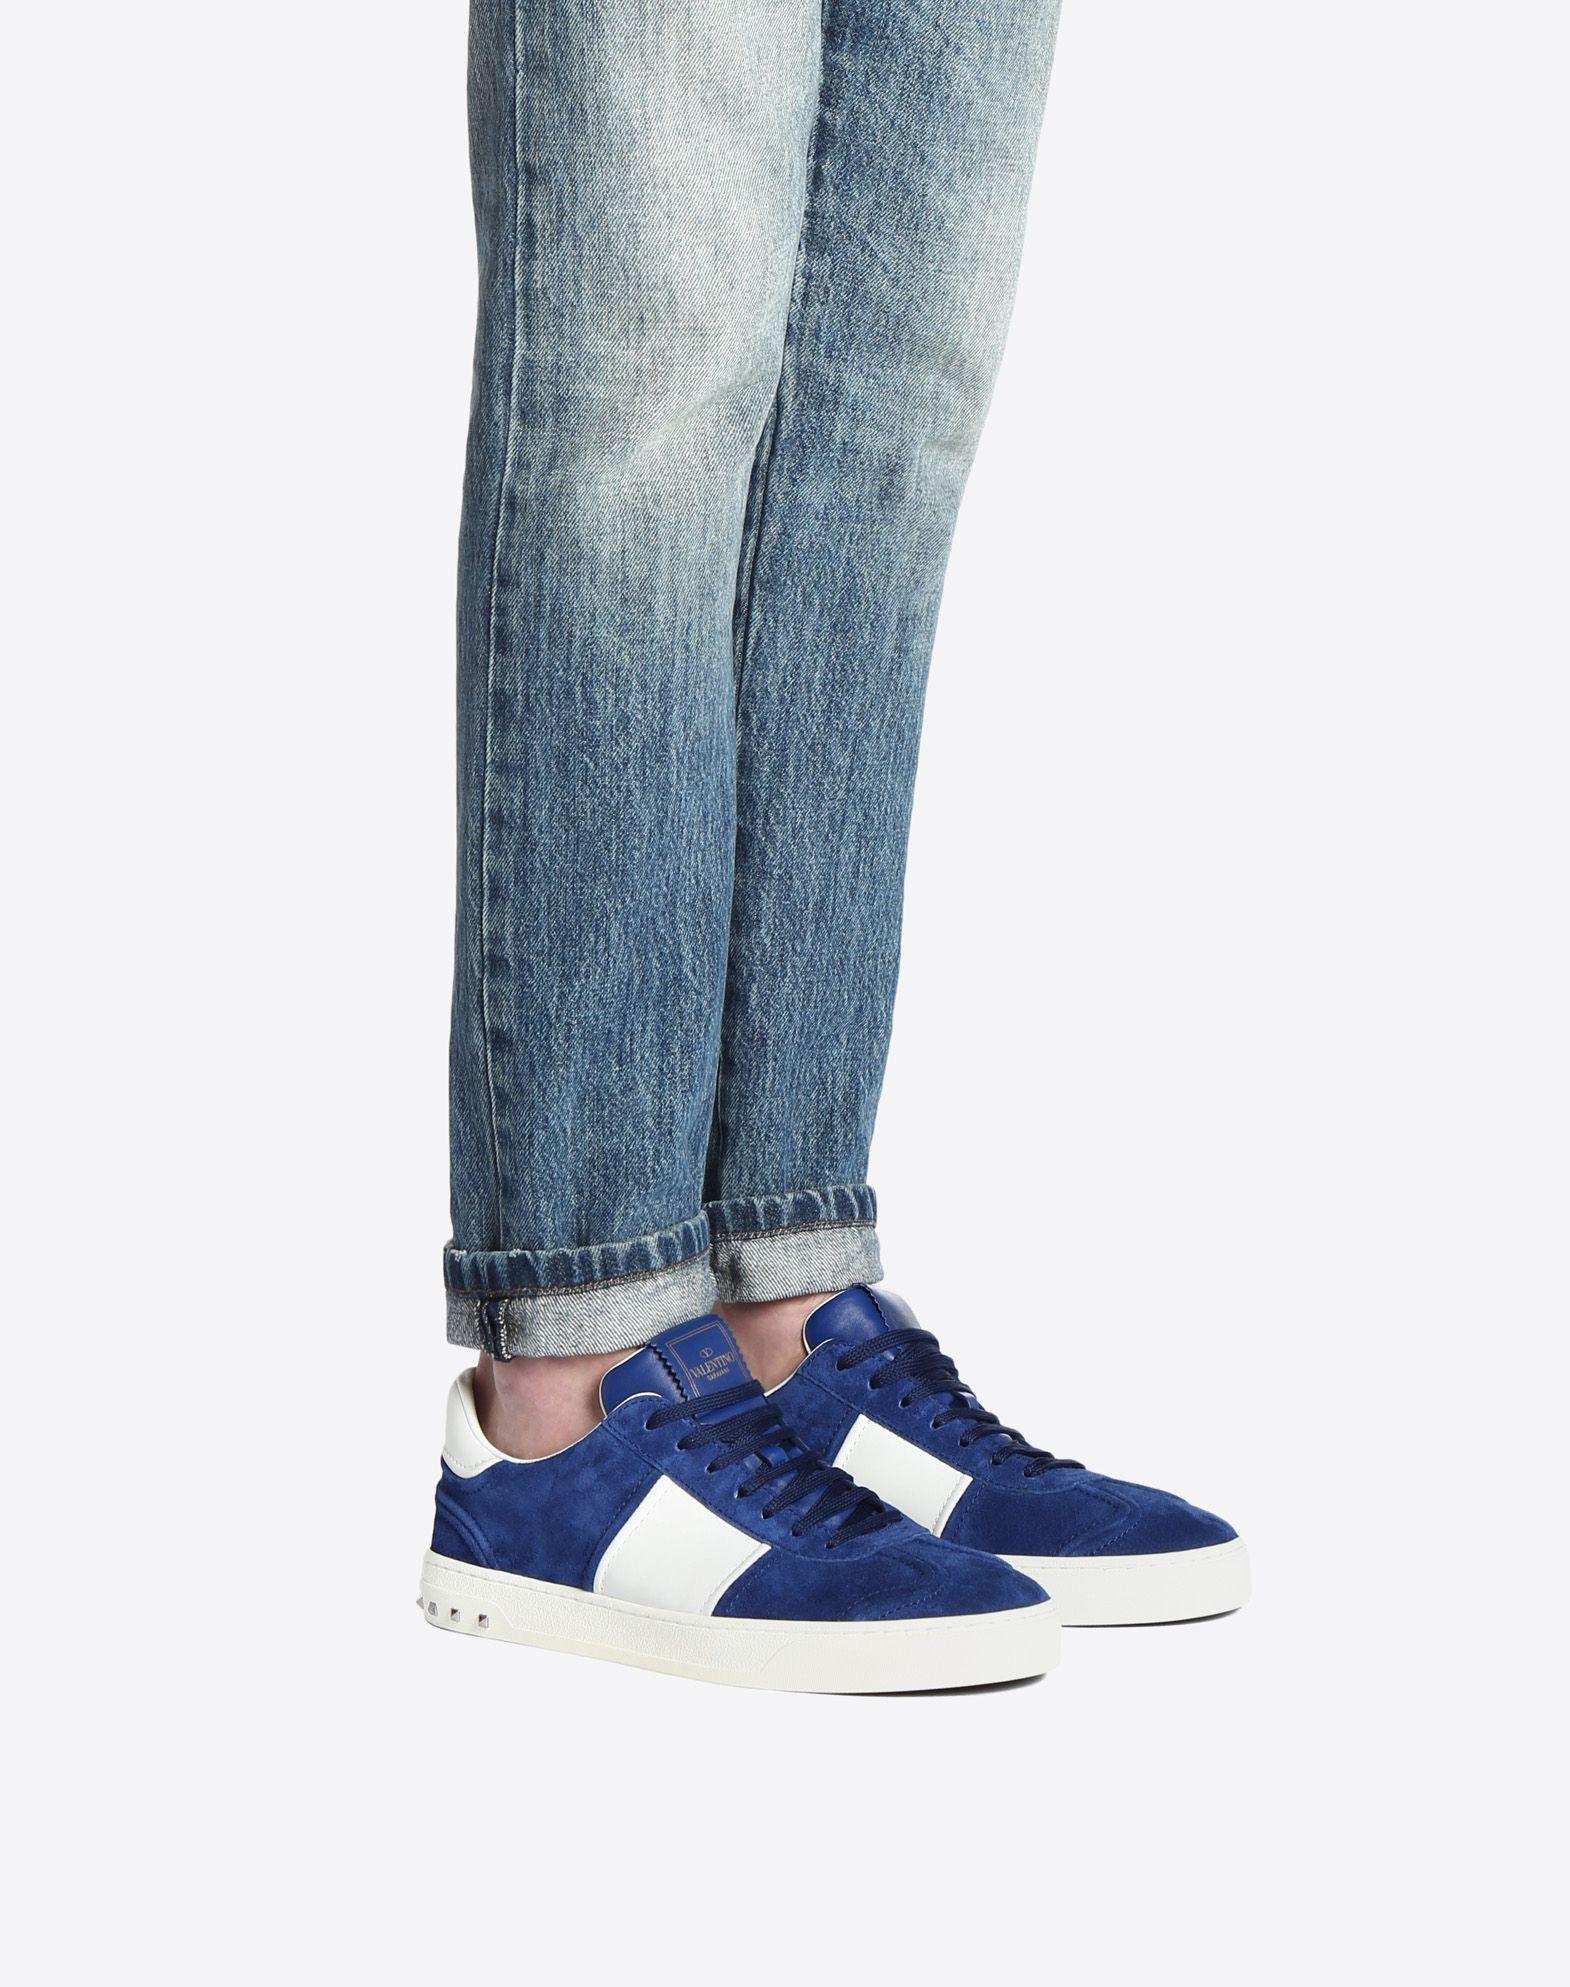 VALENTINO GARAVANI UOMO Flycrew Sneakers  LOW-TOP SNEAKERS U a